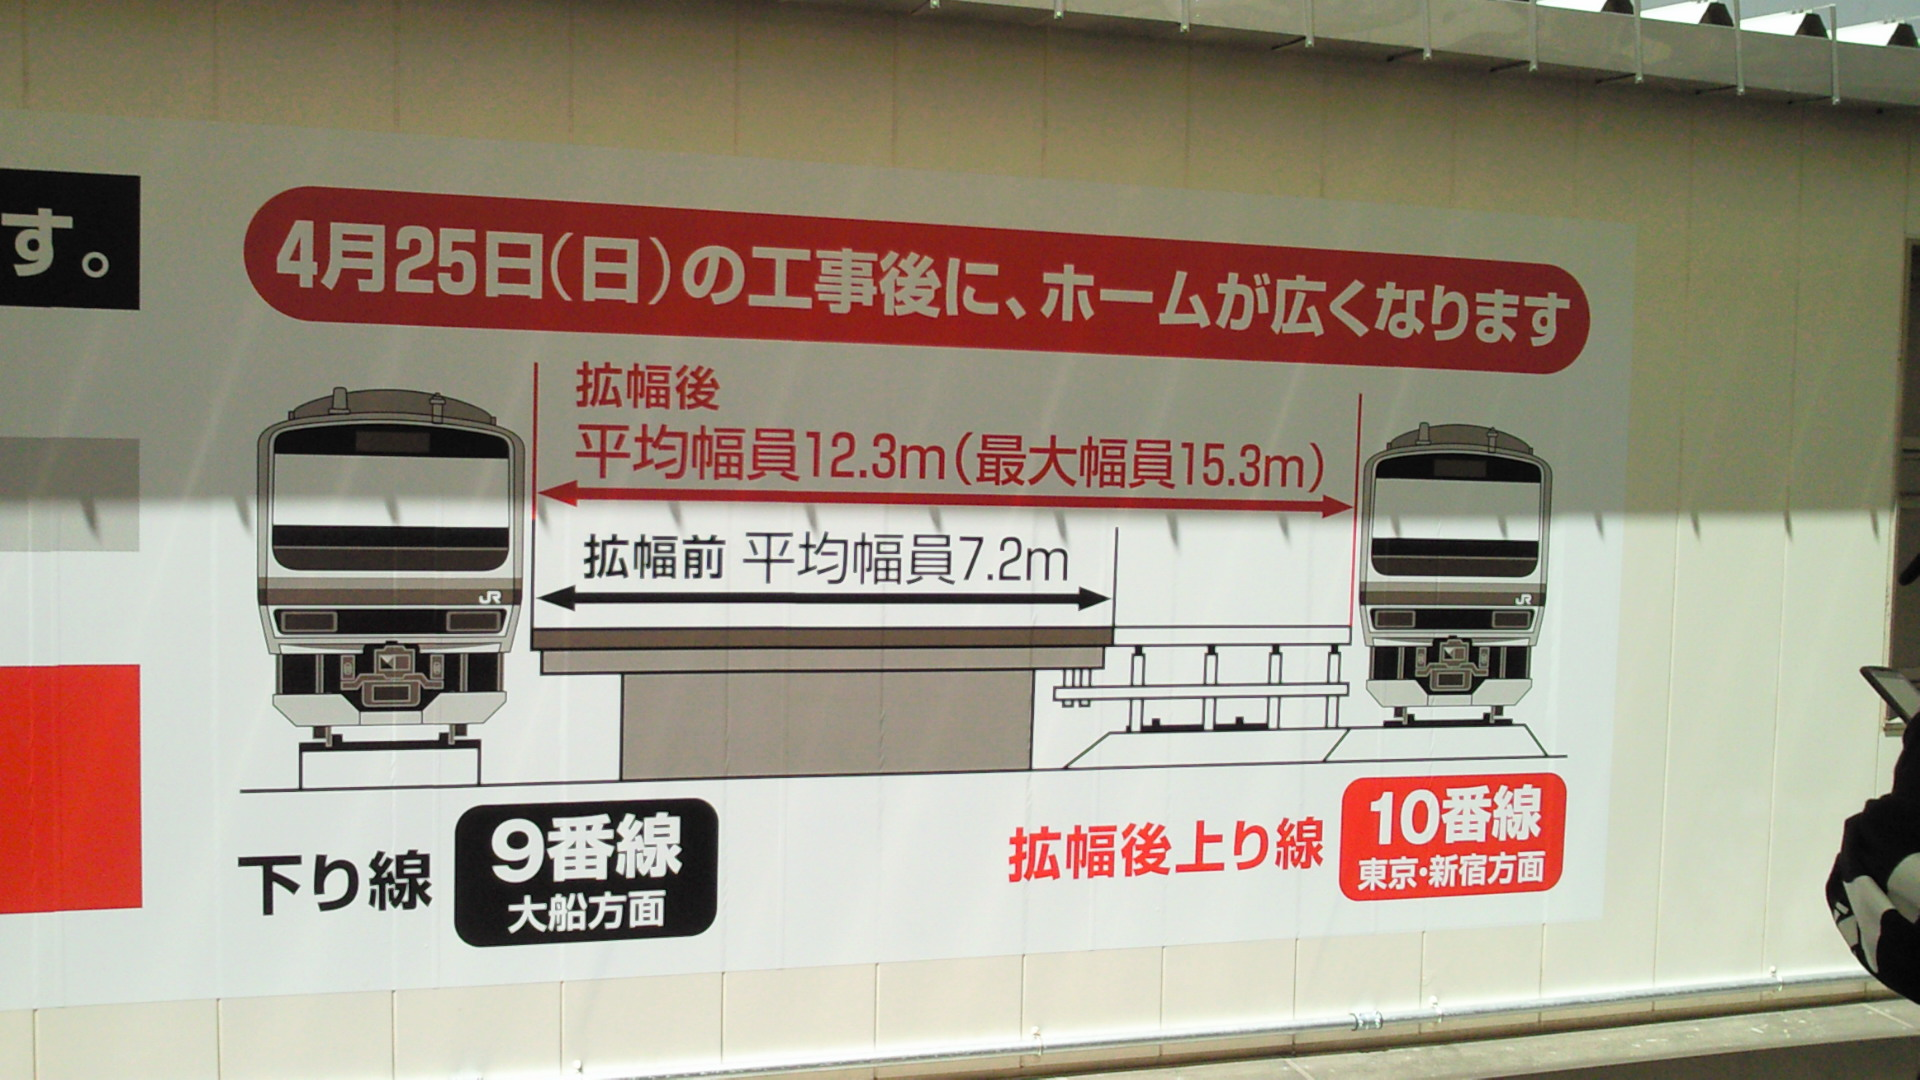 http://freshwatar-clam.up.seesaa.net/image/NEC_0017.JPG